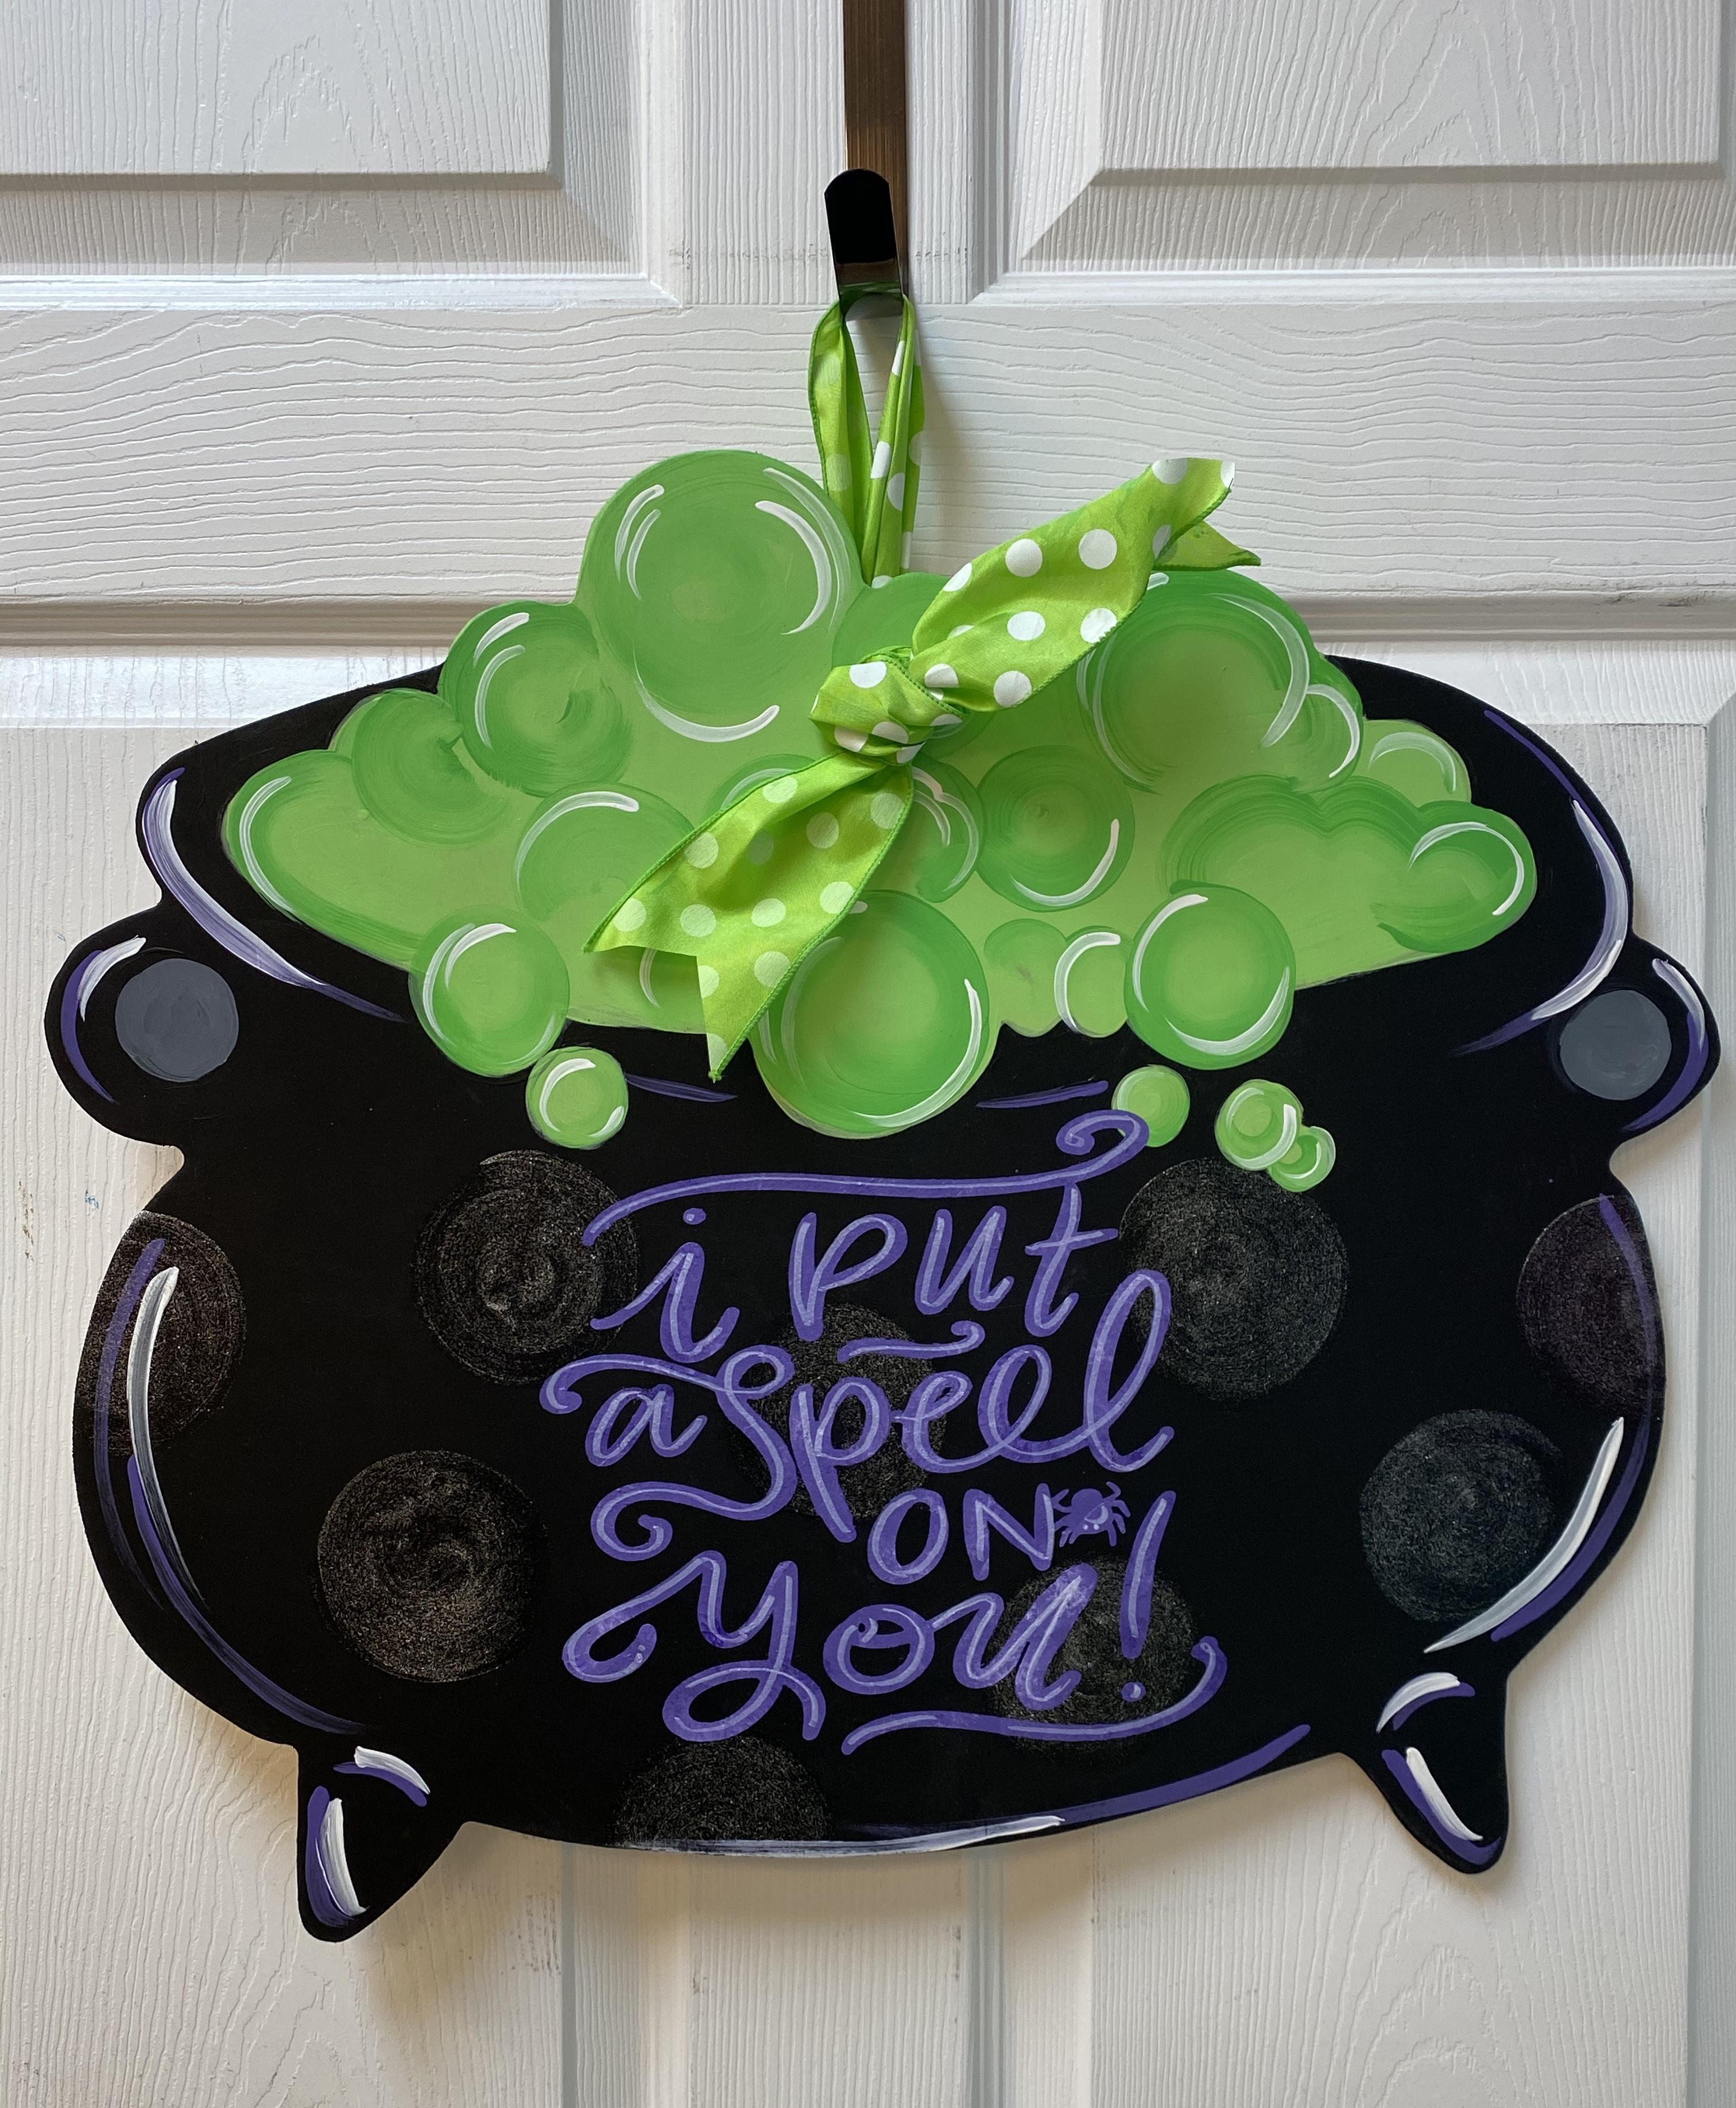 Cauldron Board